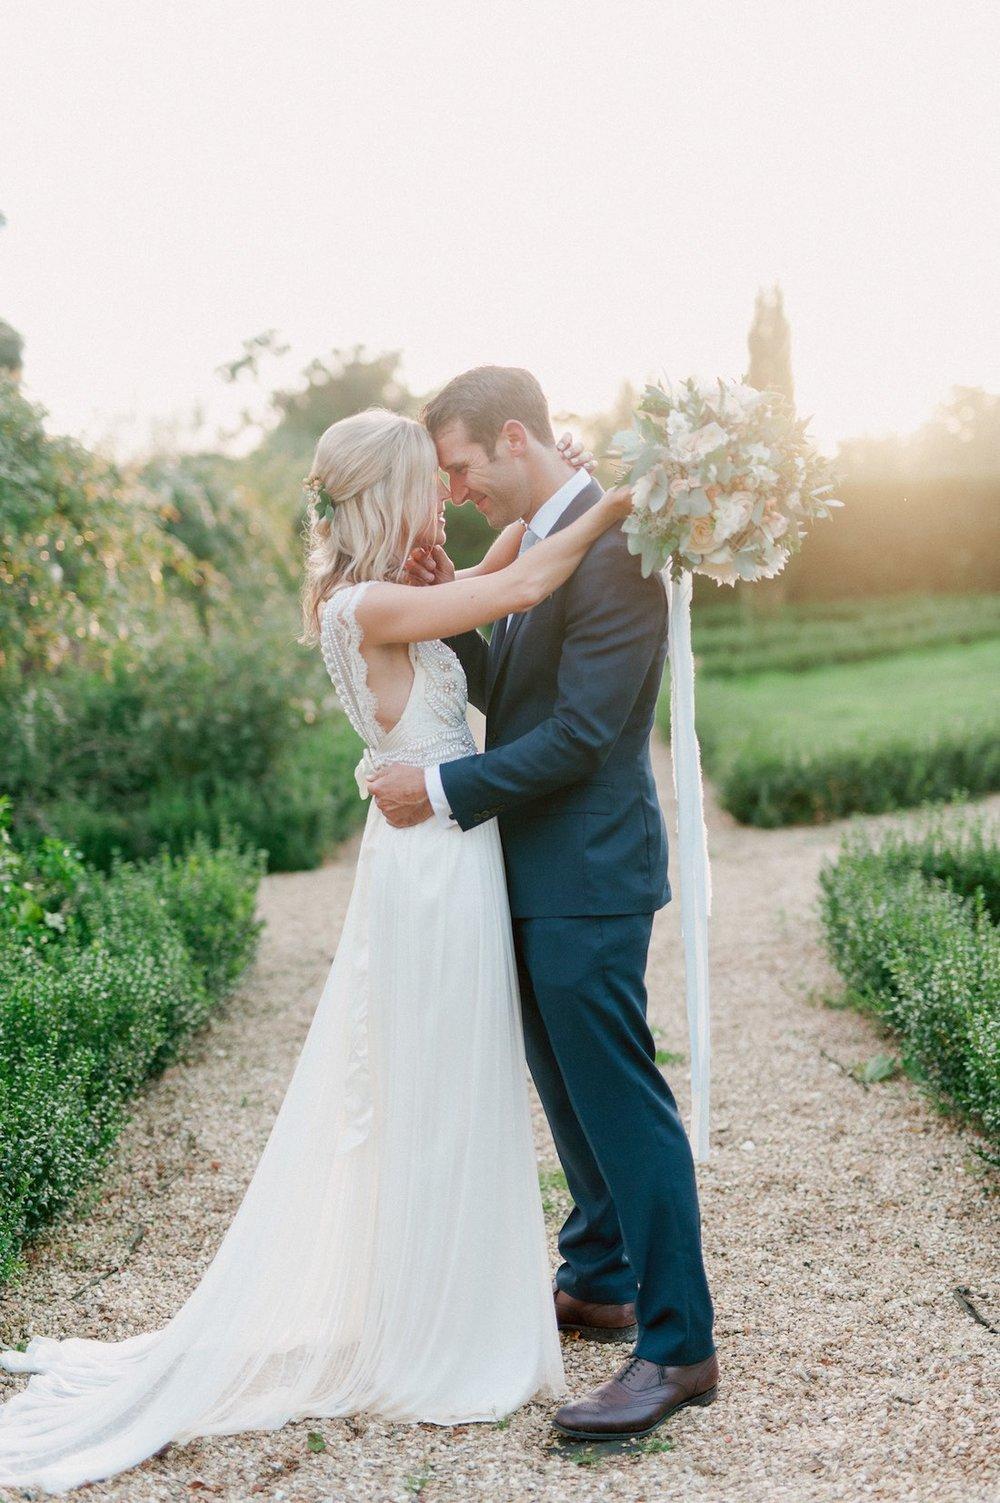 Sydney campbell wedding